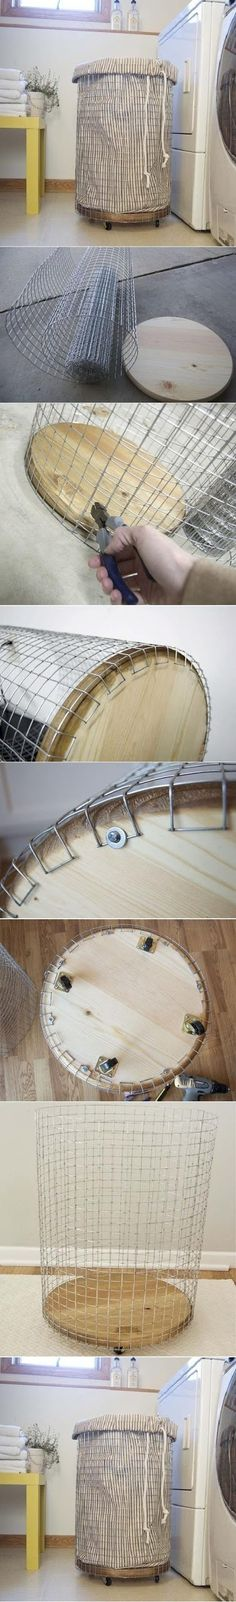 Make a Laundry Basket